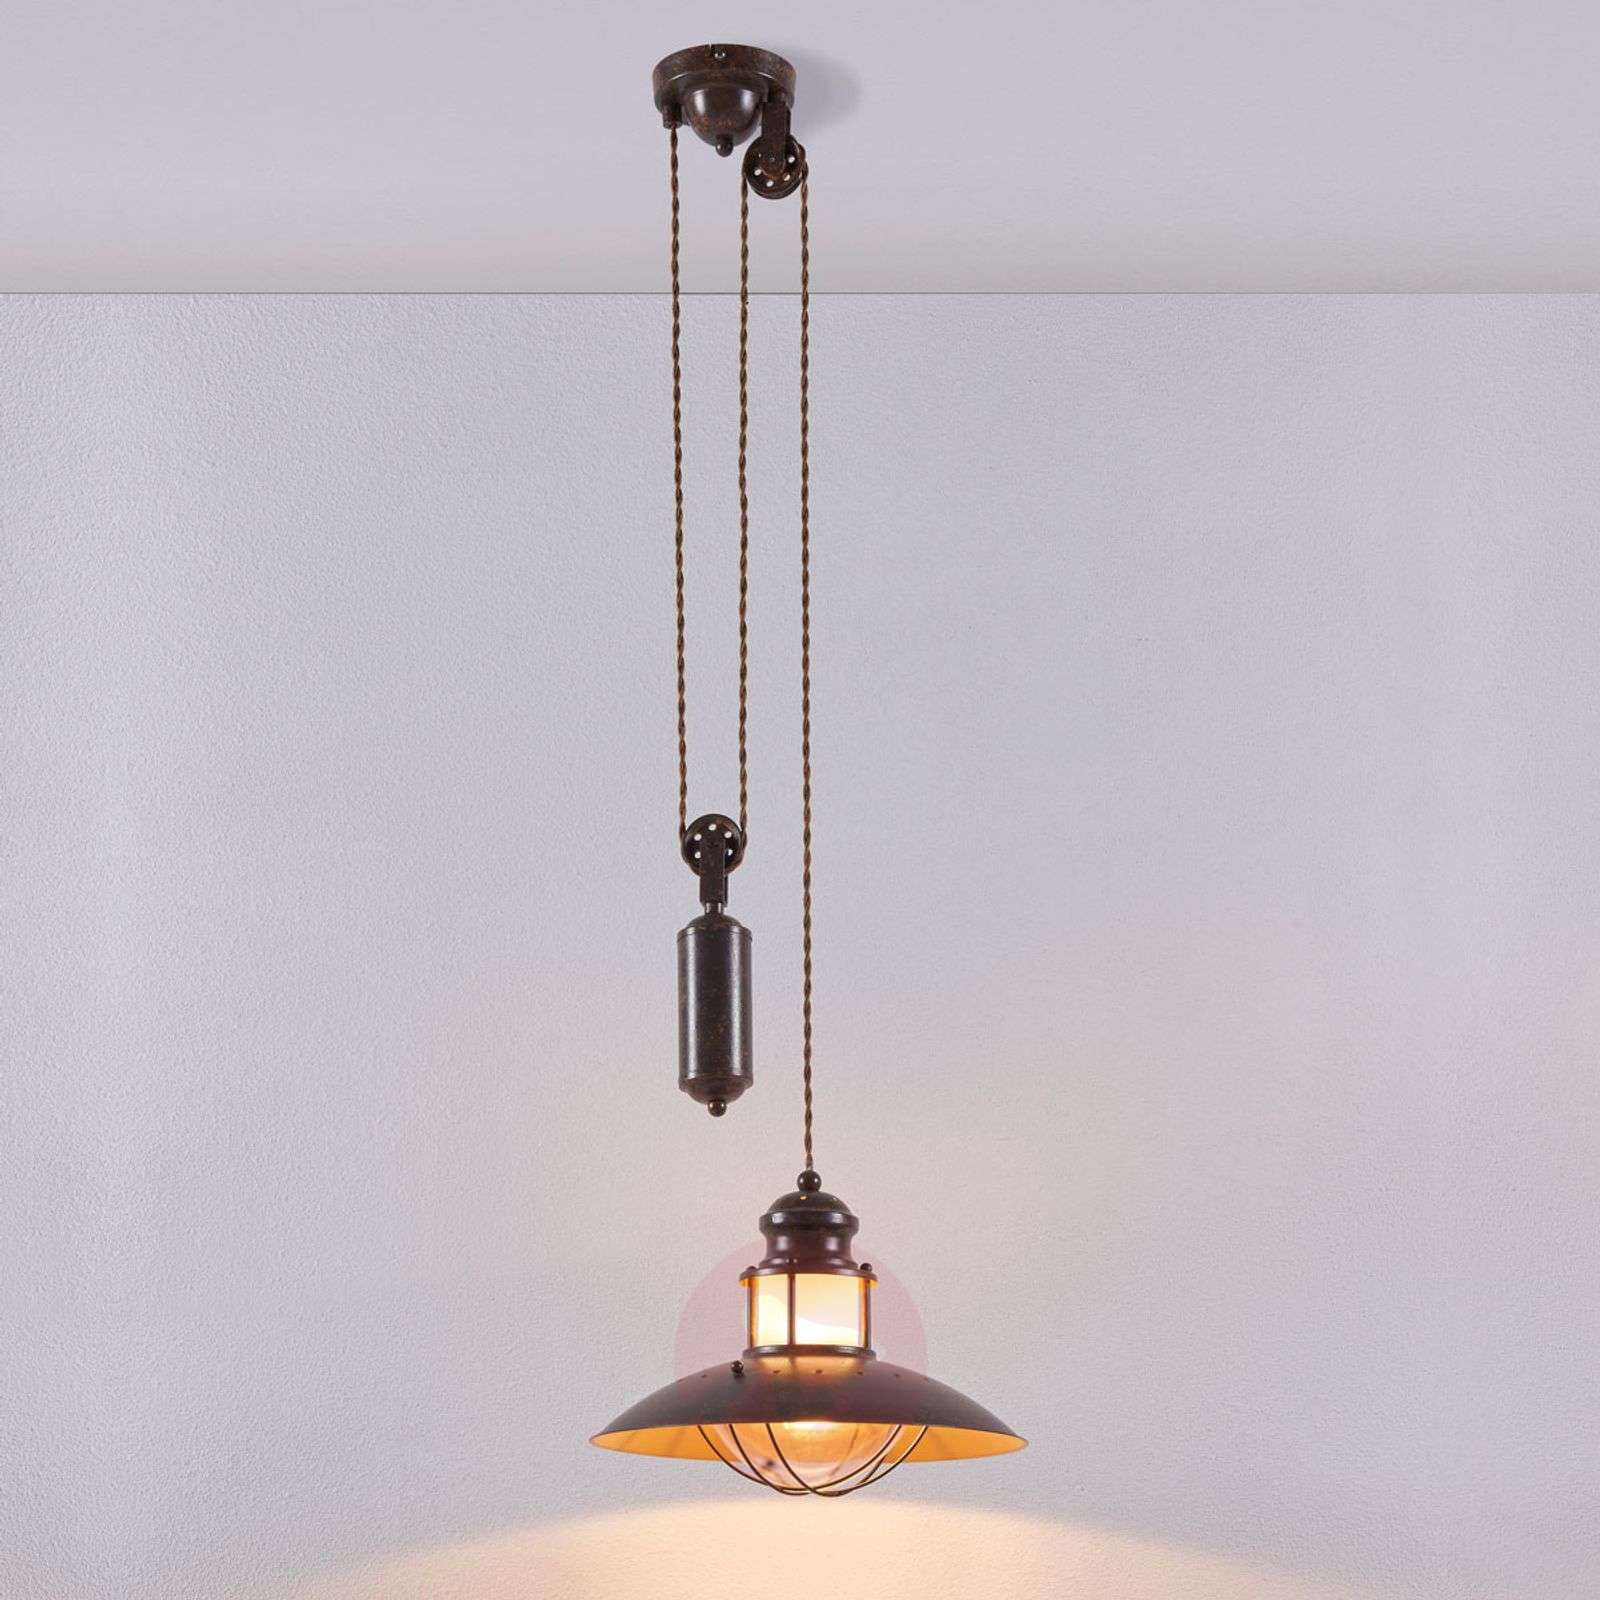 Height-adjustable Louisanne pendant light-9621018-02